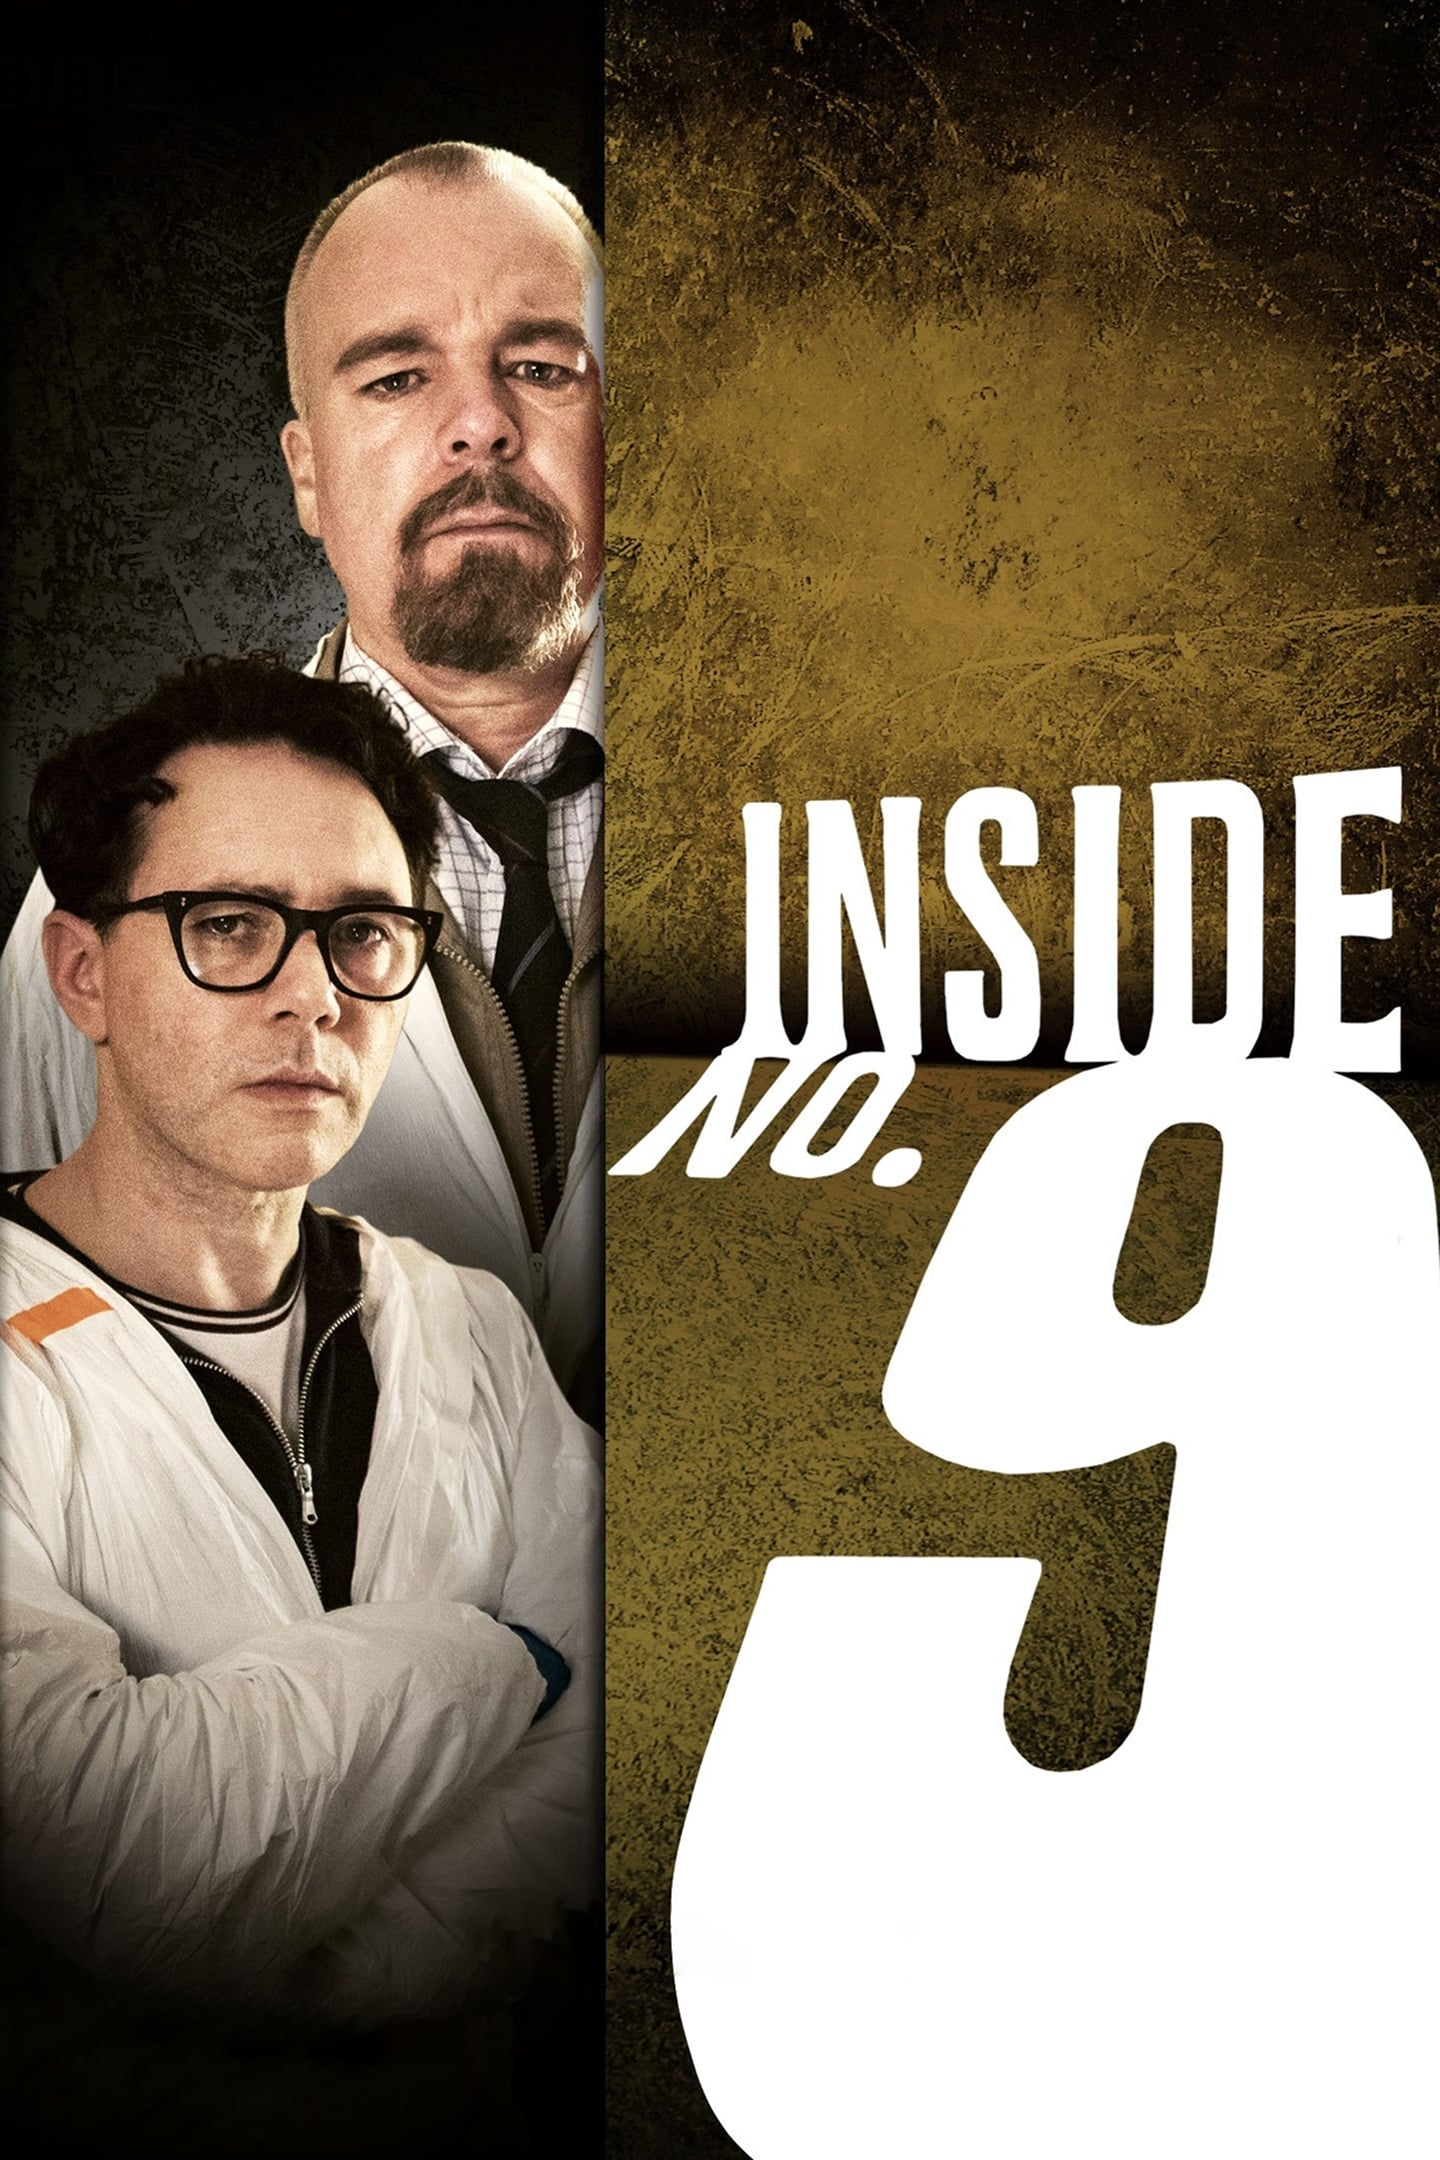 image for Inside No. 9